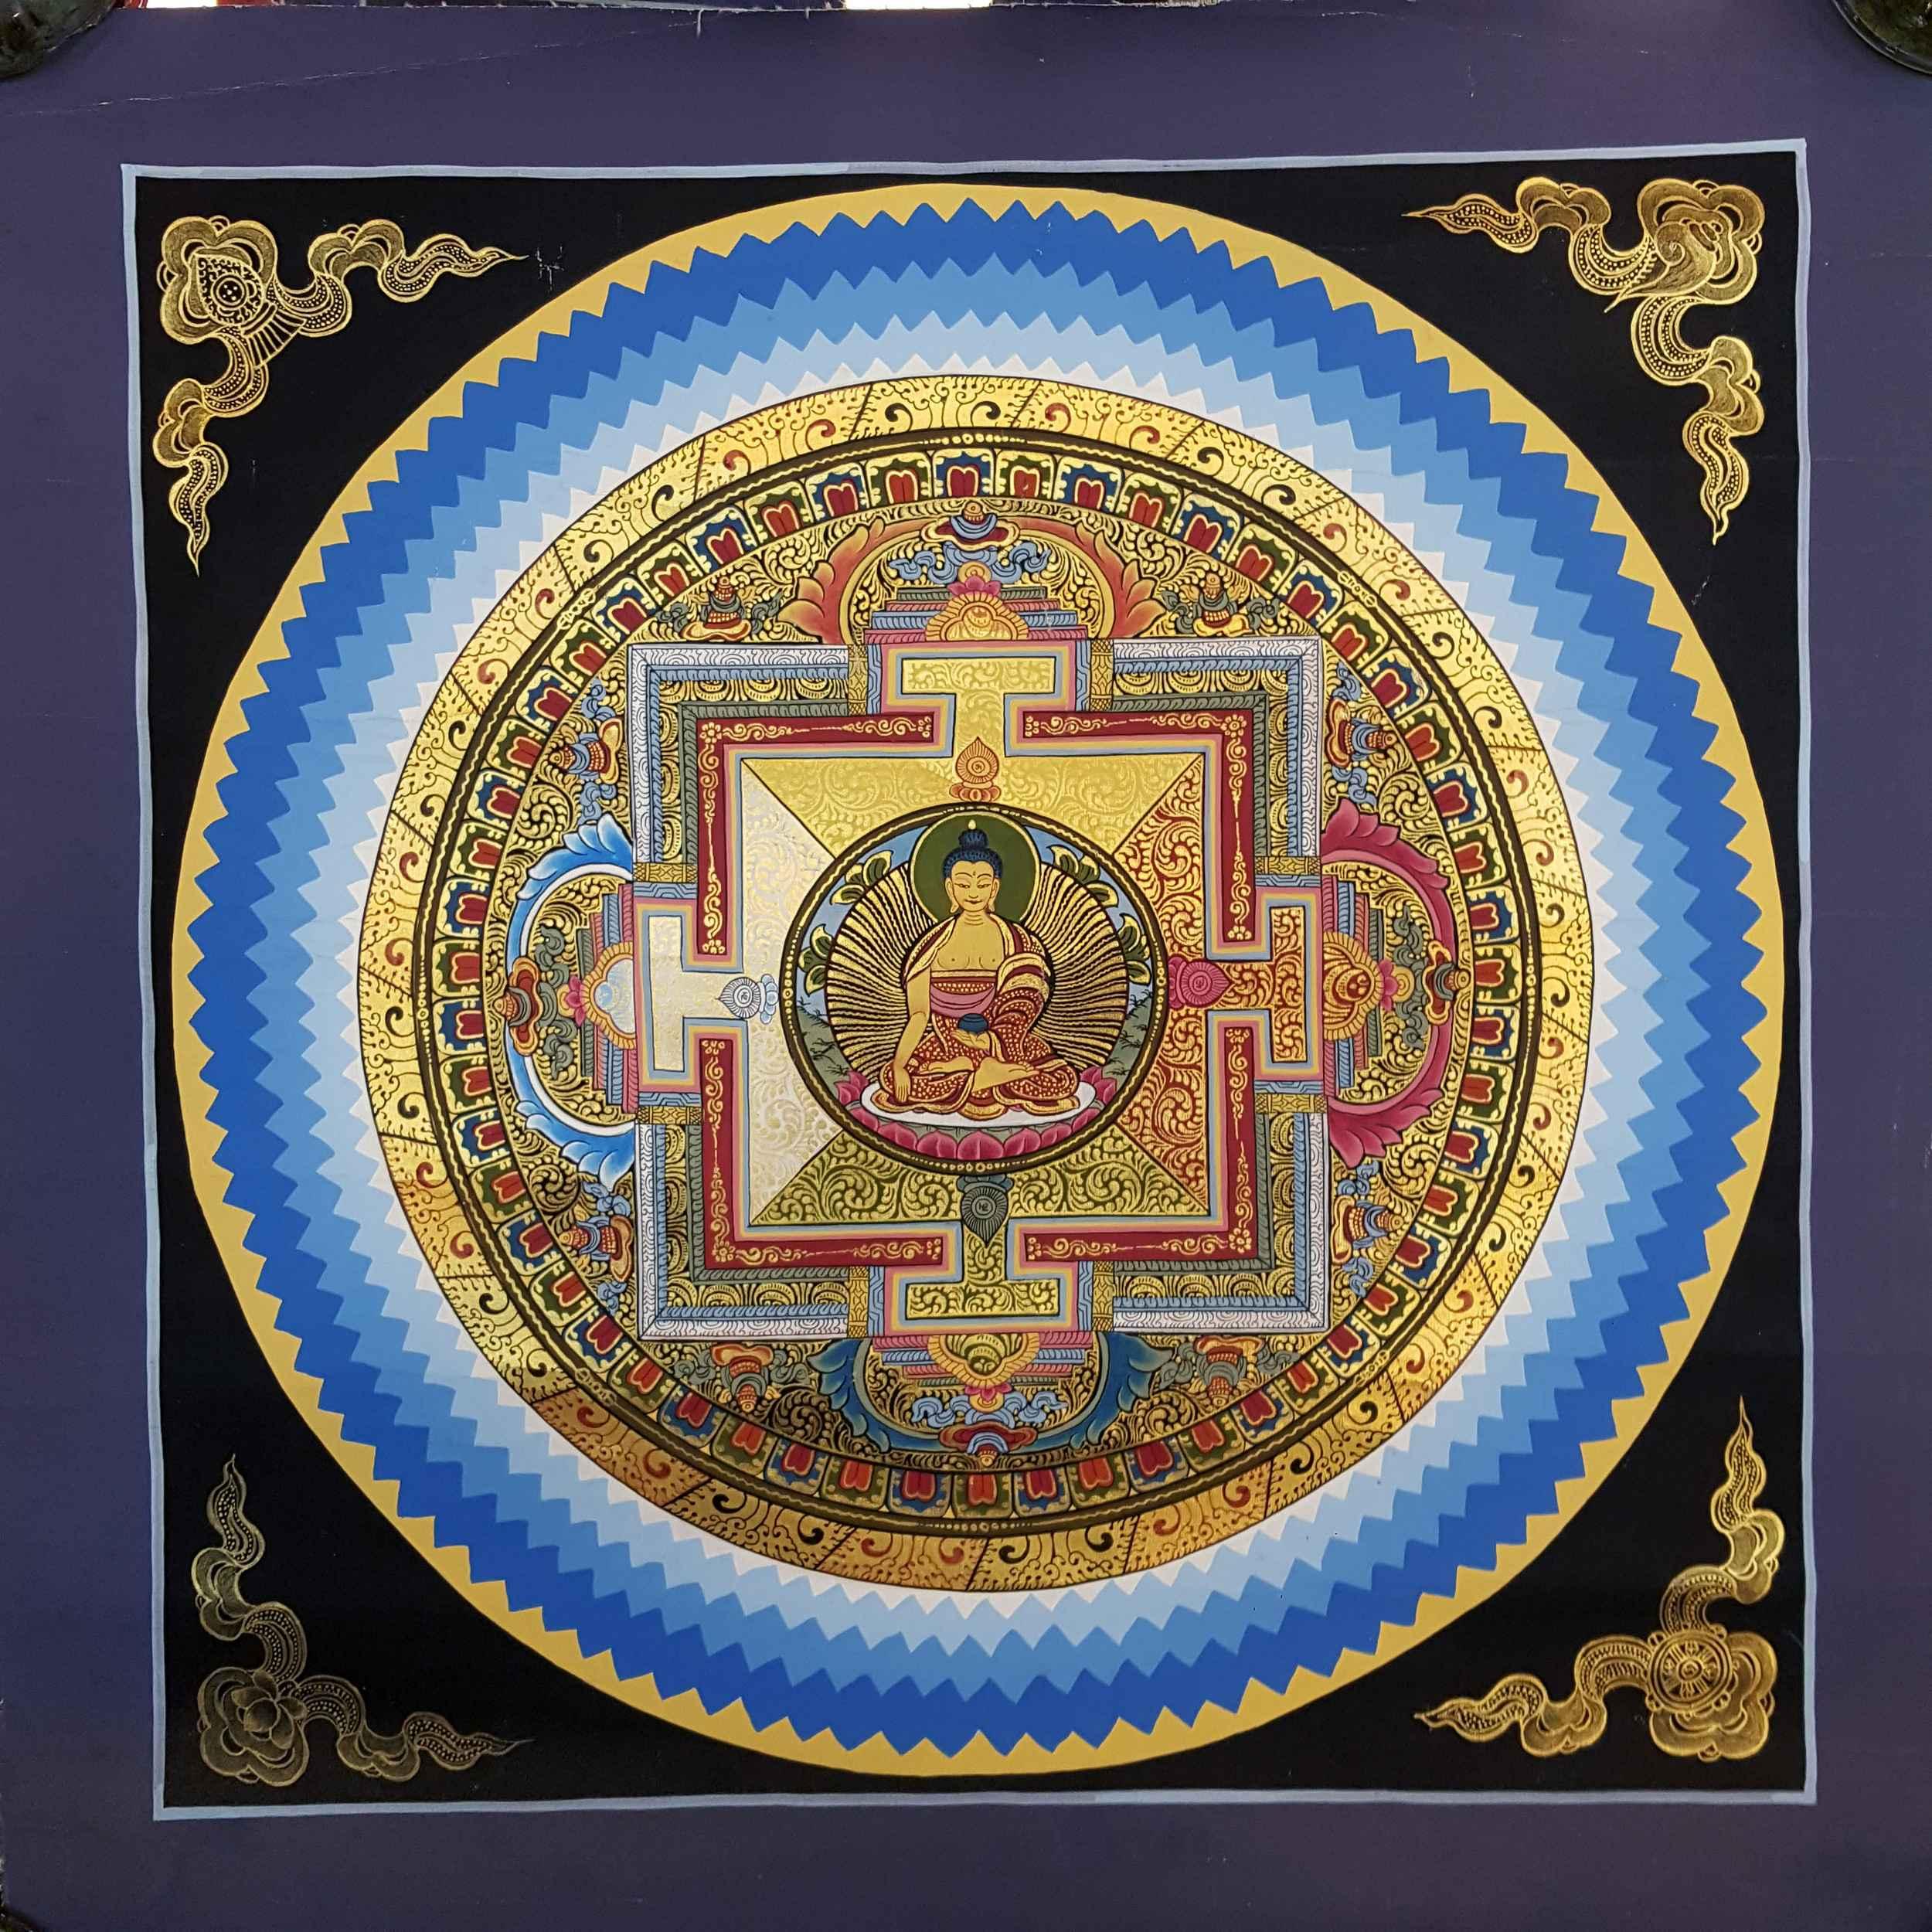 Baocicco 10x10ft Indian Golden Brahmanism Mandala Buddhism Mandala Lotus Photography Background Backdrop Bohemian Sparkly Meditation Mandala Wall Geometric Medallion Vinyl Photo Studio Props